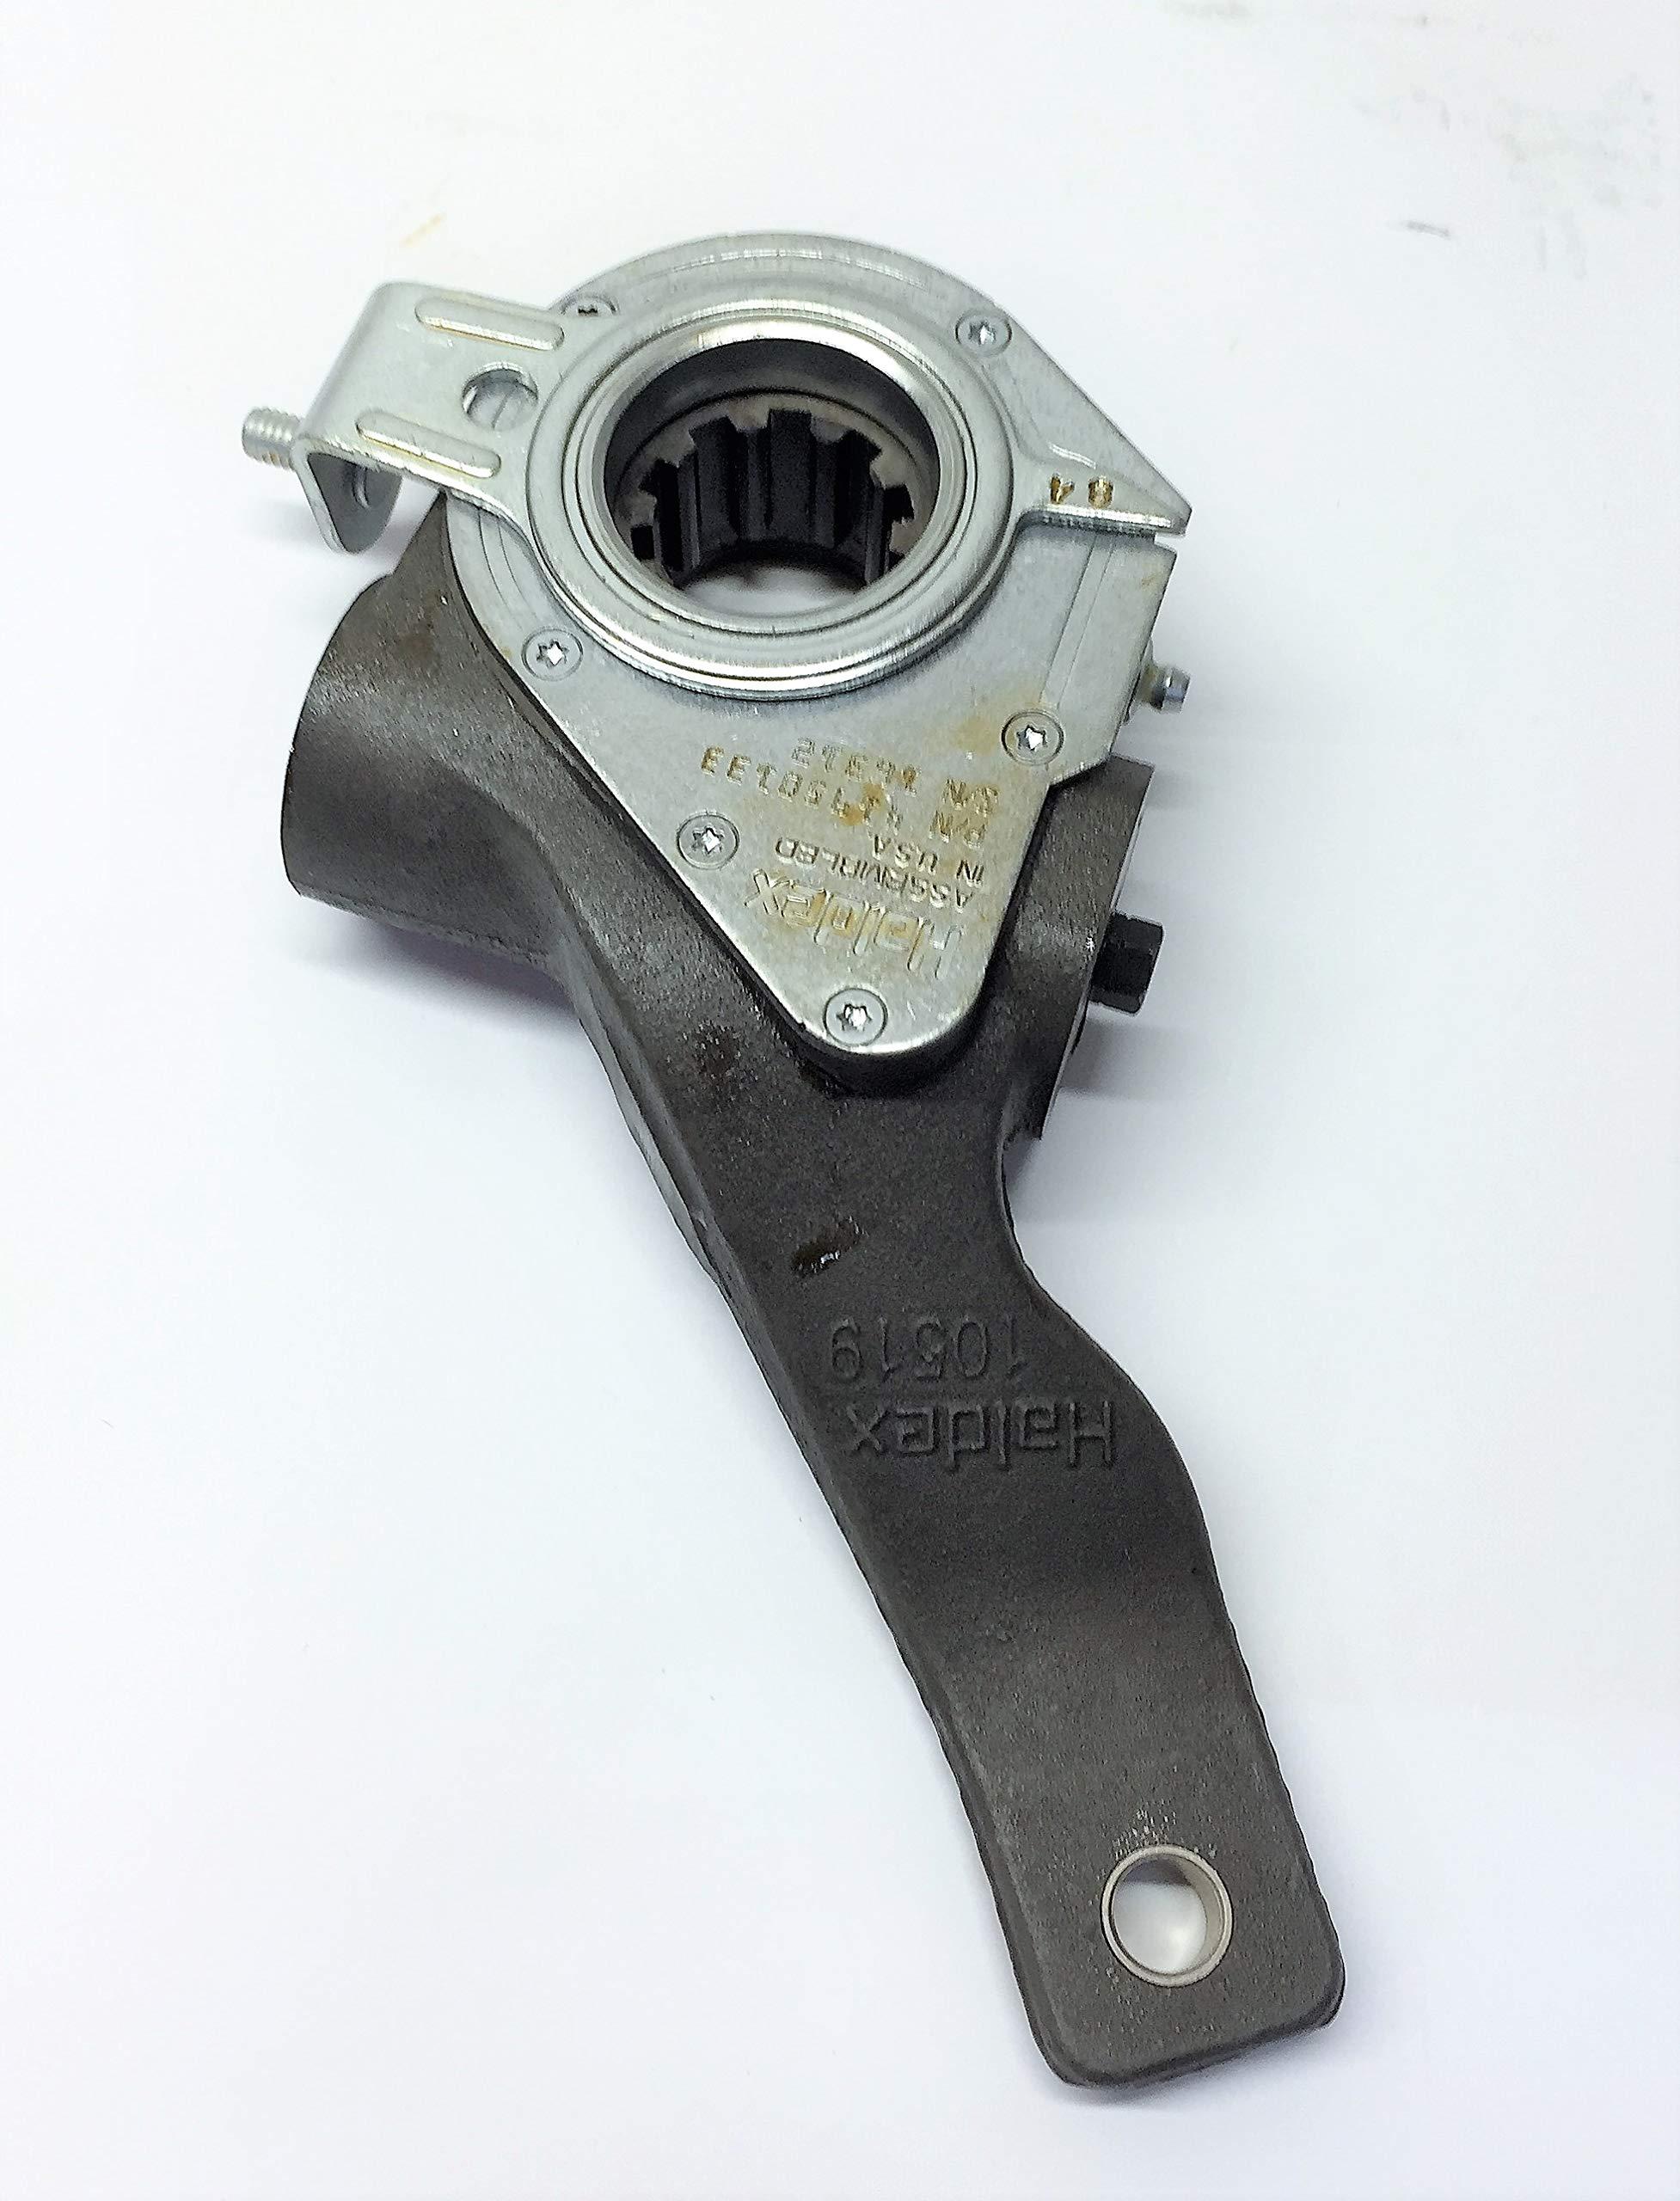 Haldex Automatic Brake Adjuster 300-10001 by Haldex (Image #5)